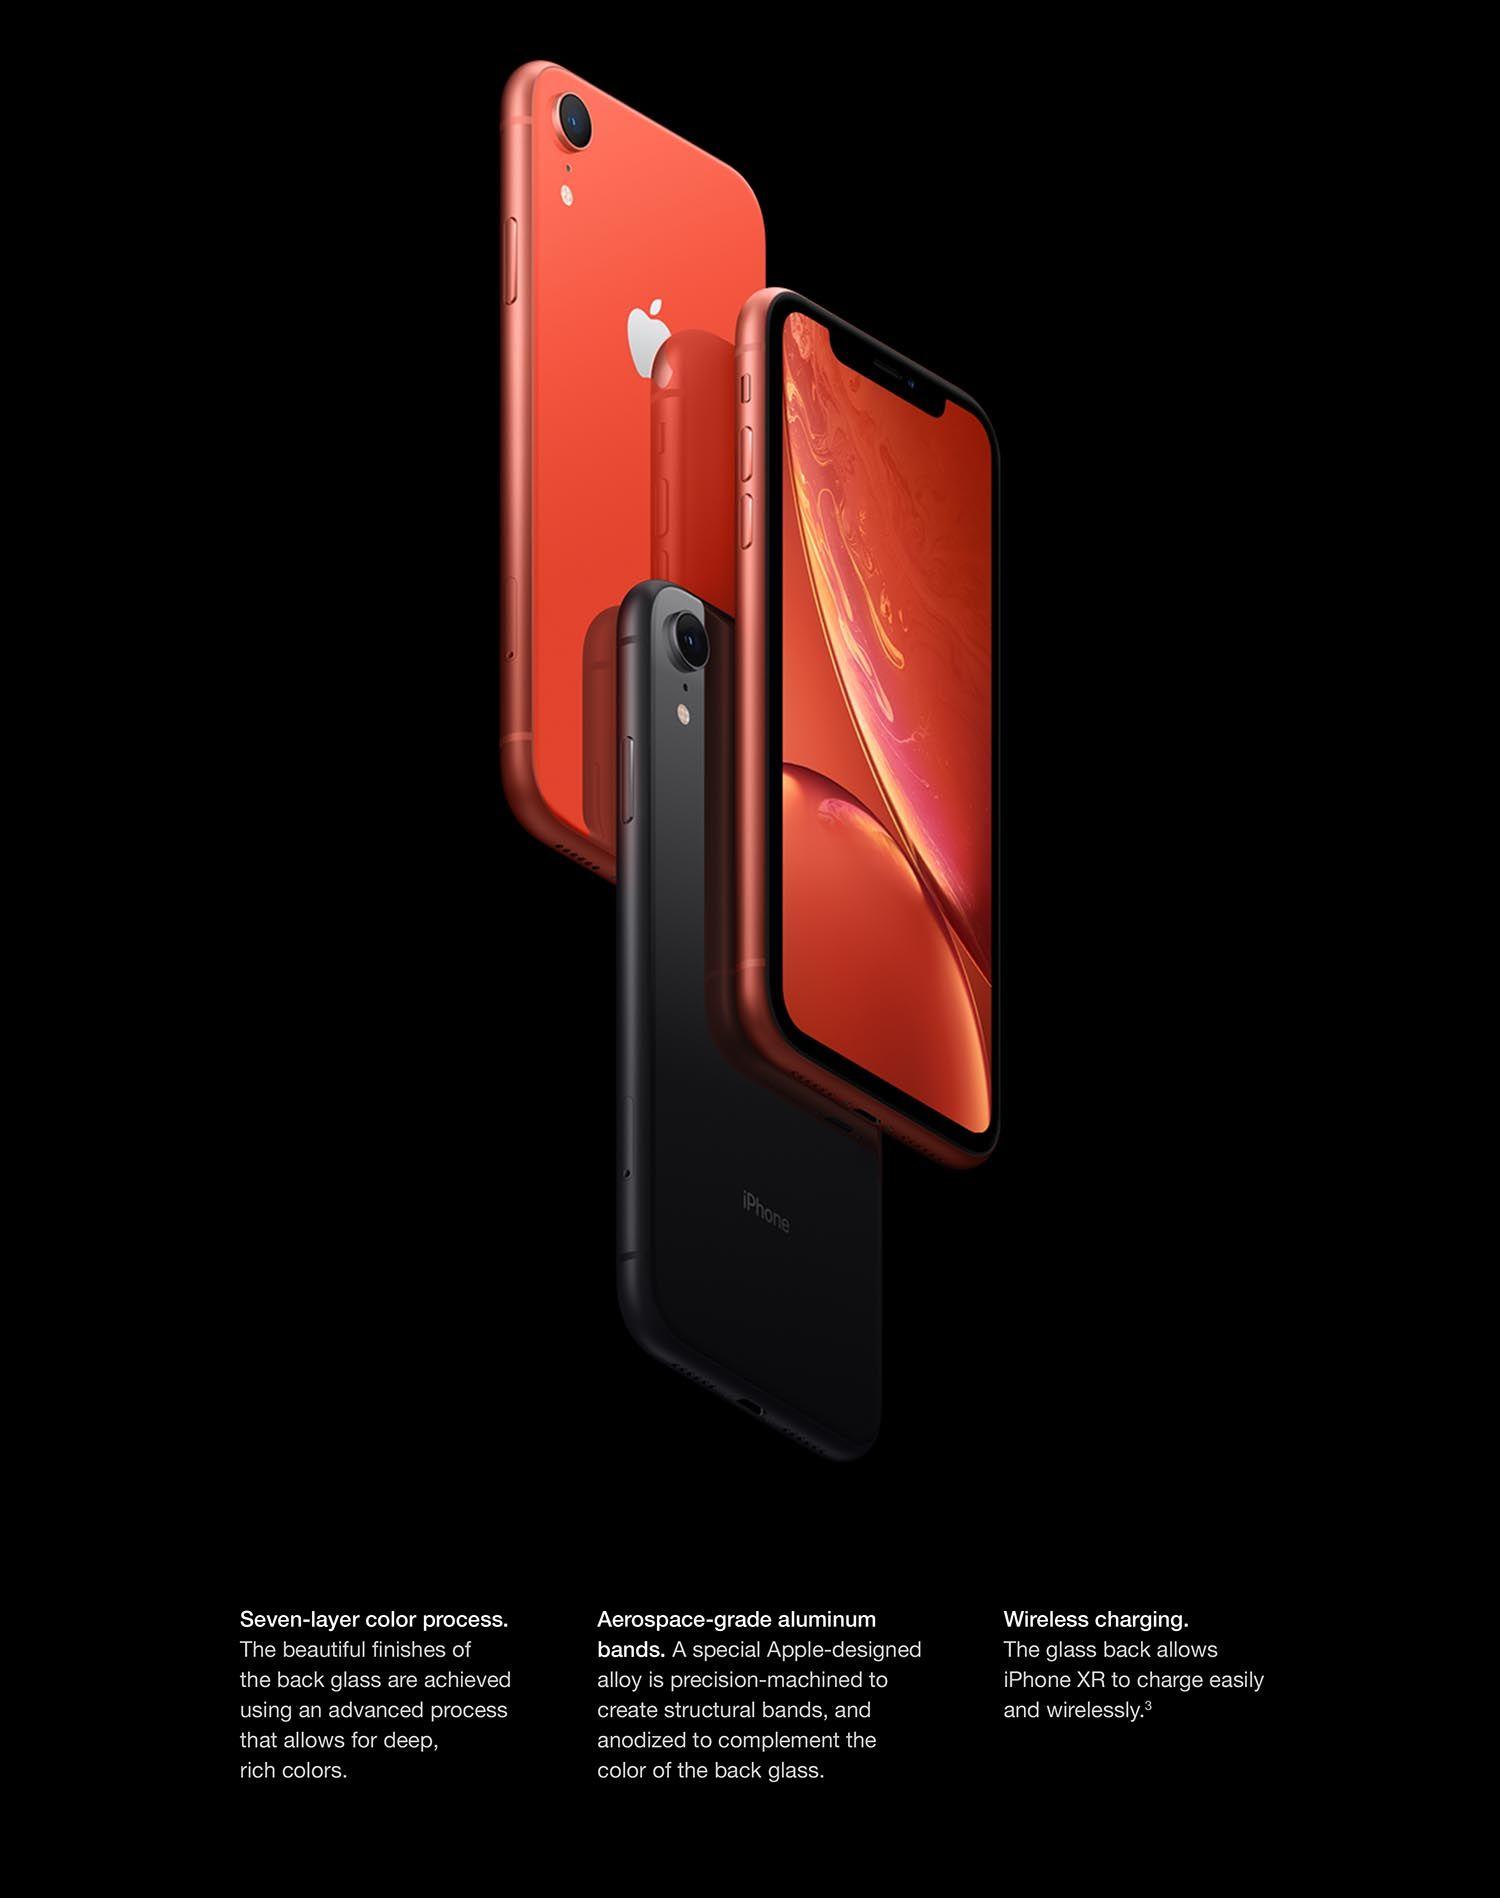 Apple iphone xr 64gb black carrier locked carrier